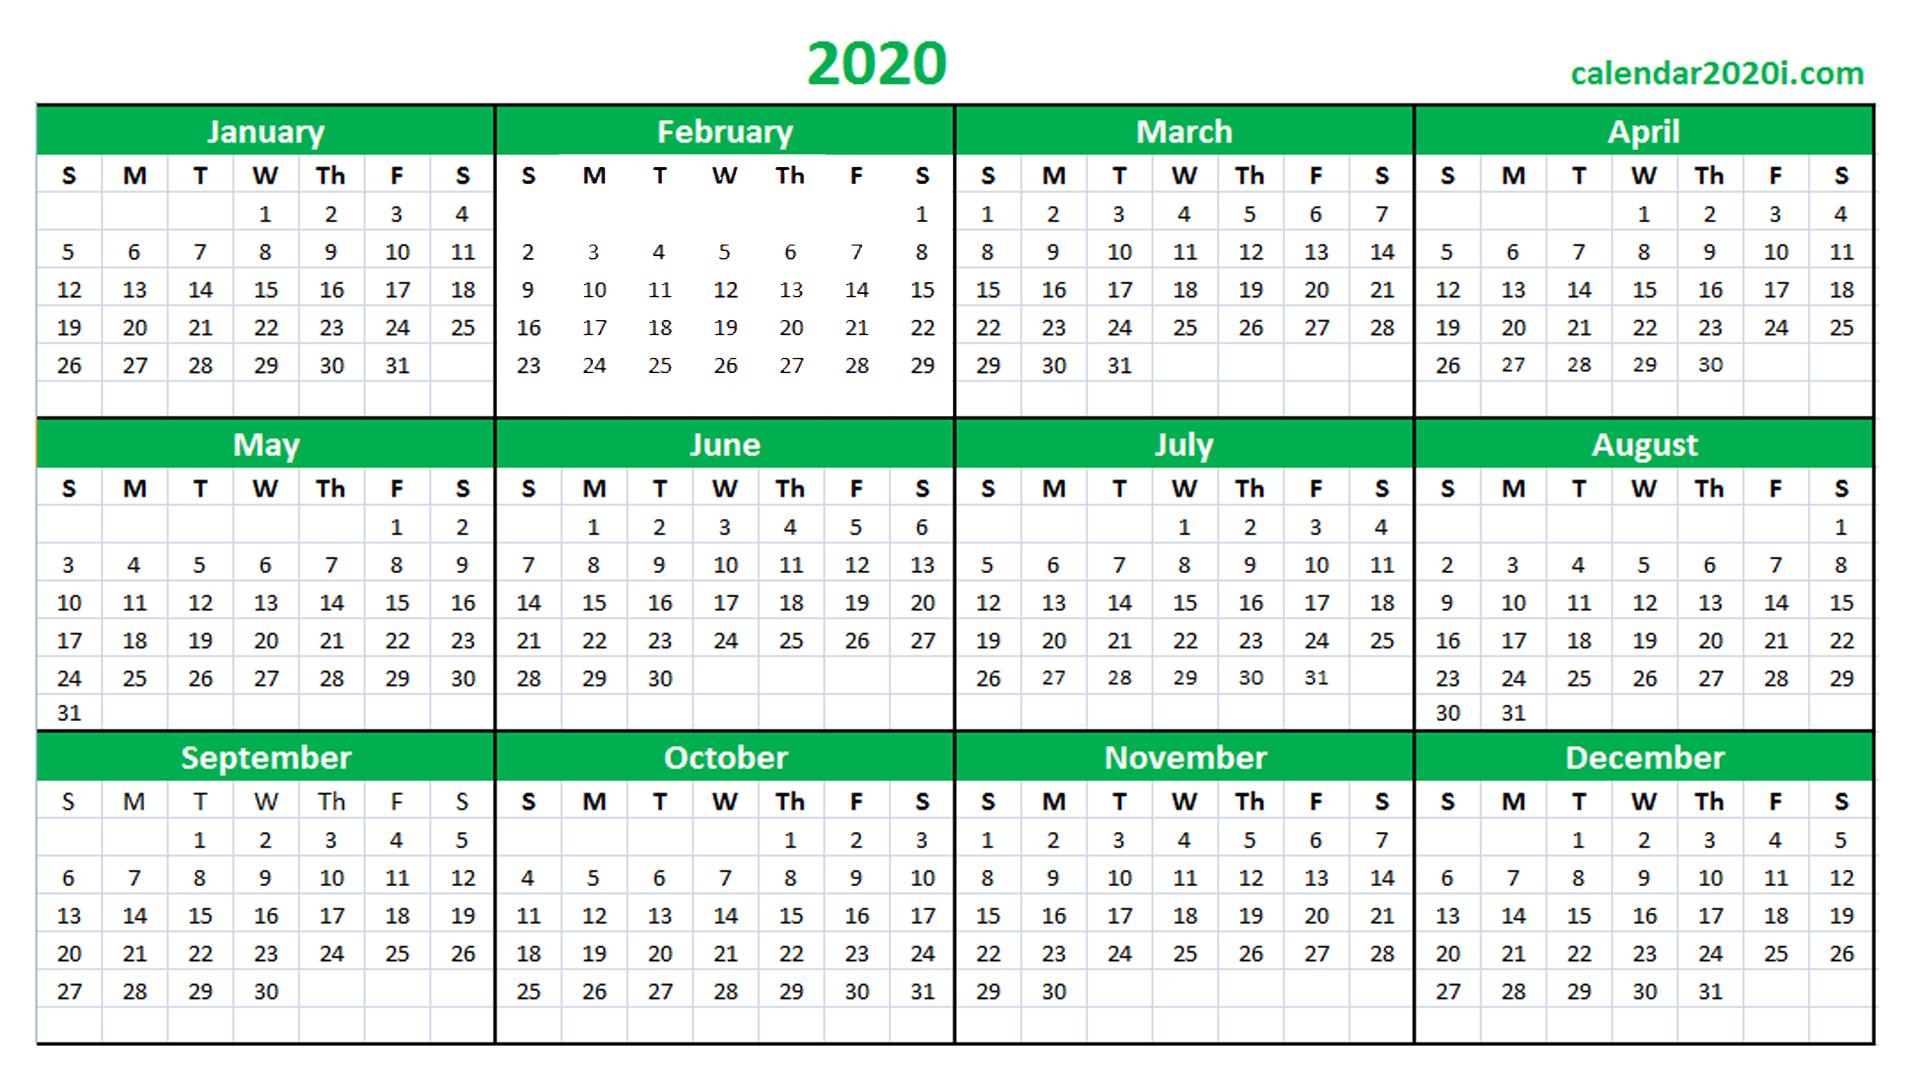 Qld School Calendar 2020 Printable